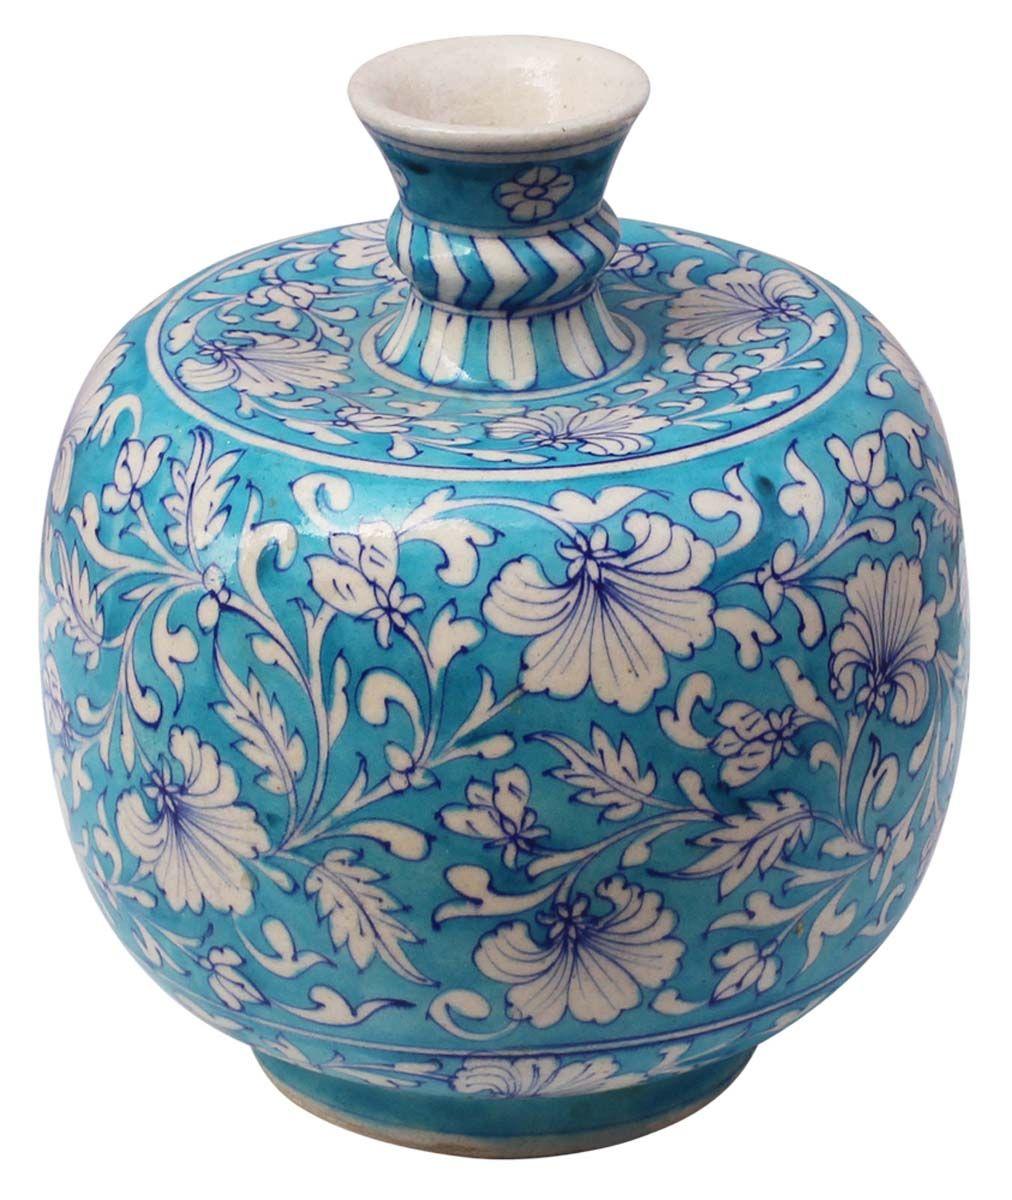 Bulk wholesale handmade 9 potshaped large ceramic flower